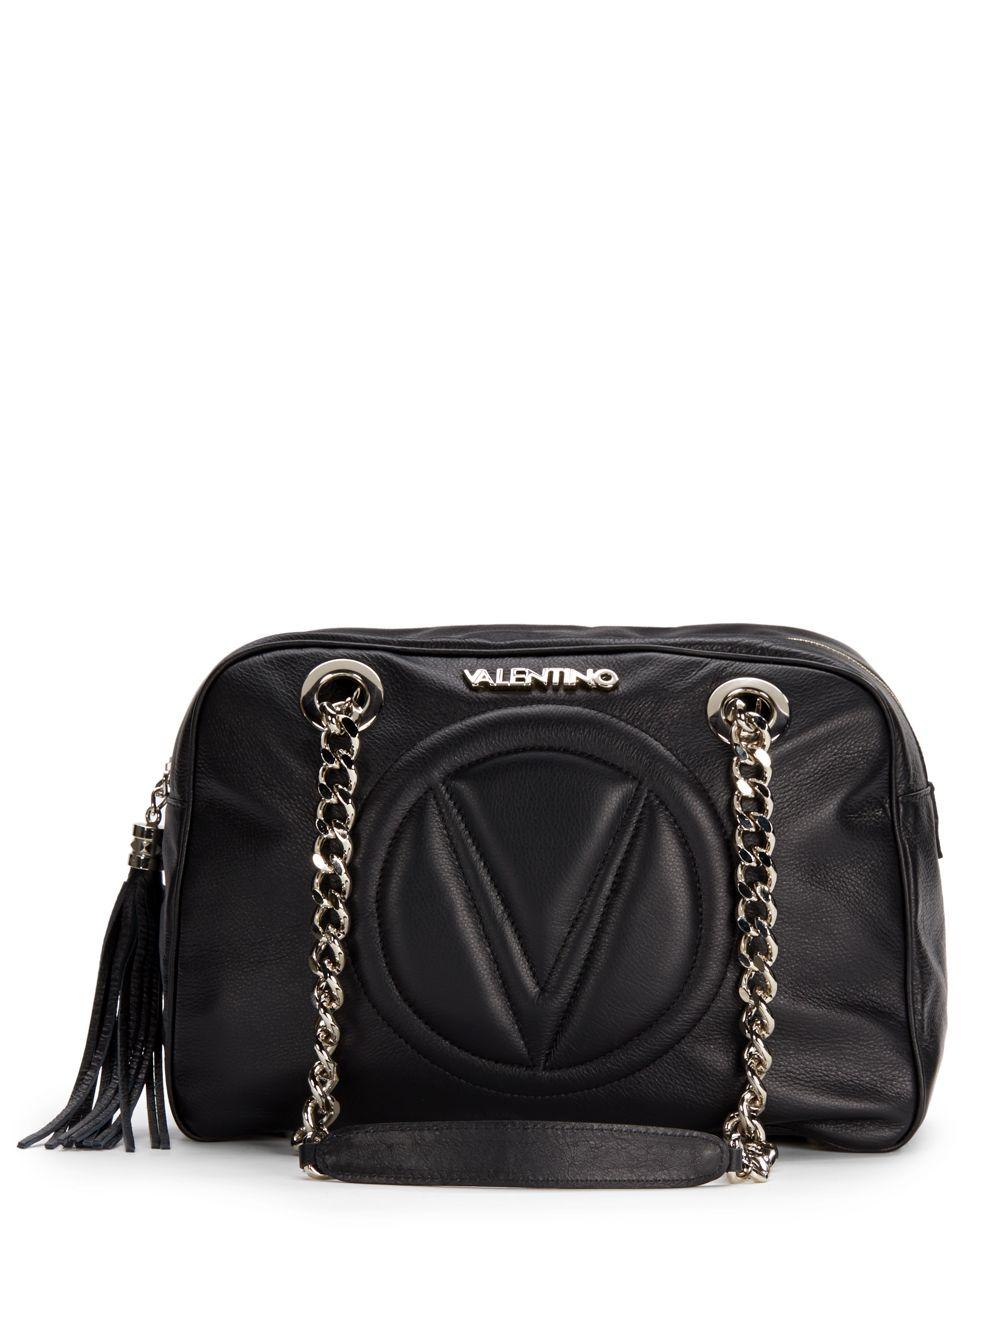 Valentino By Mario Valentino Leather Madonna Embossed Logo